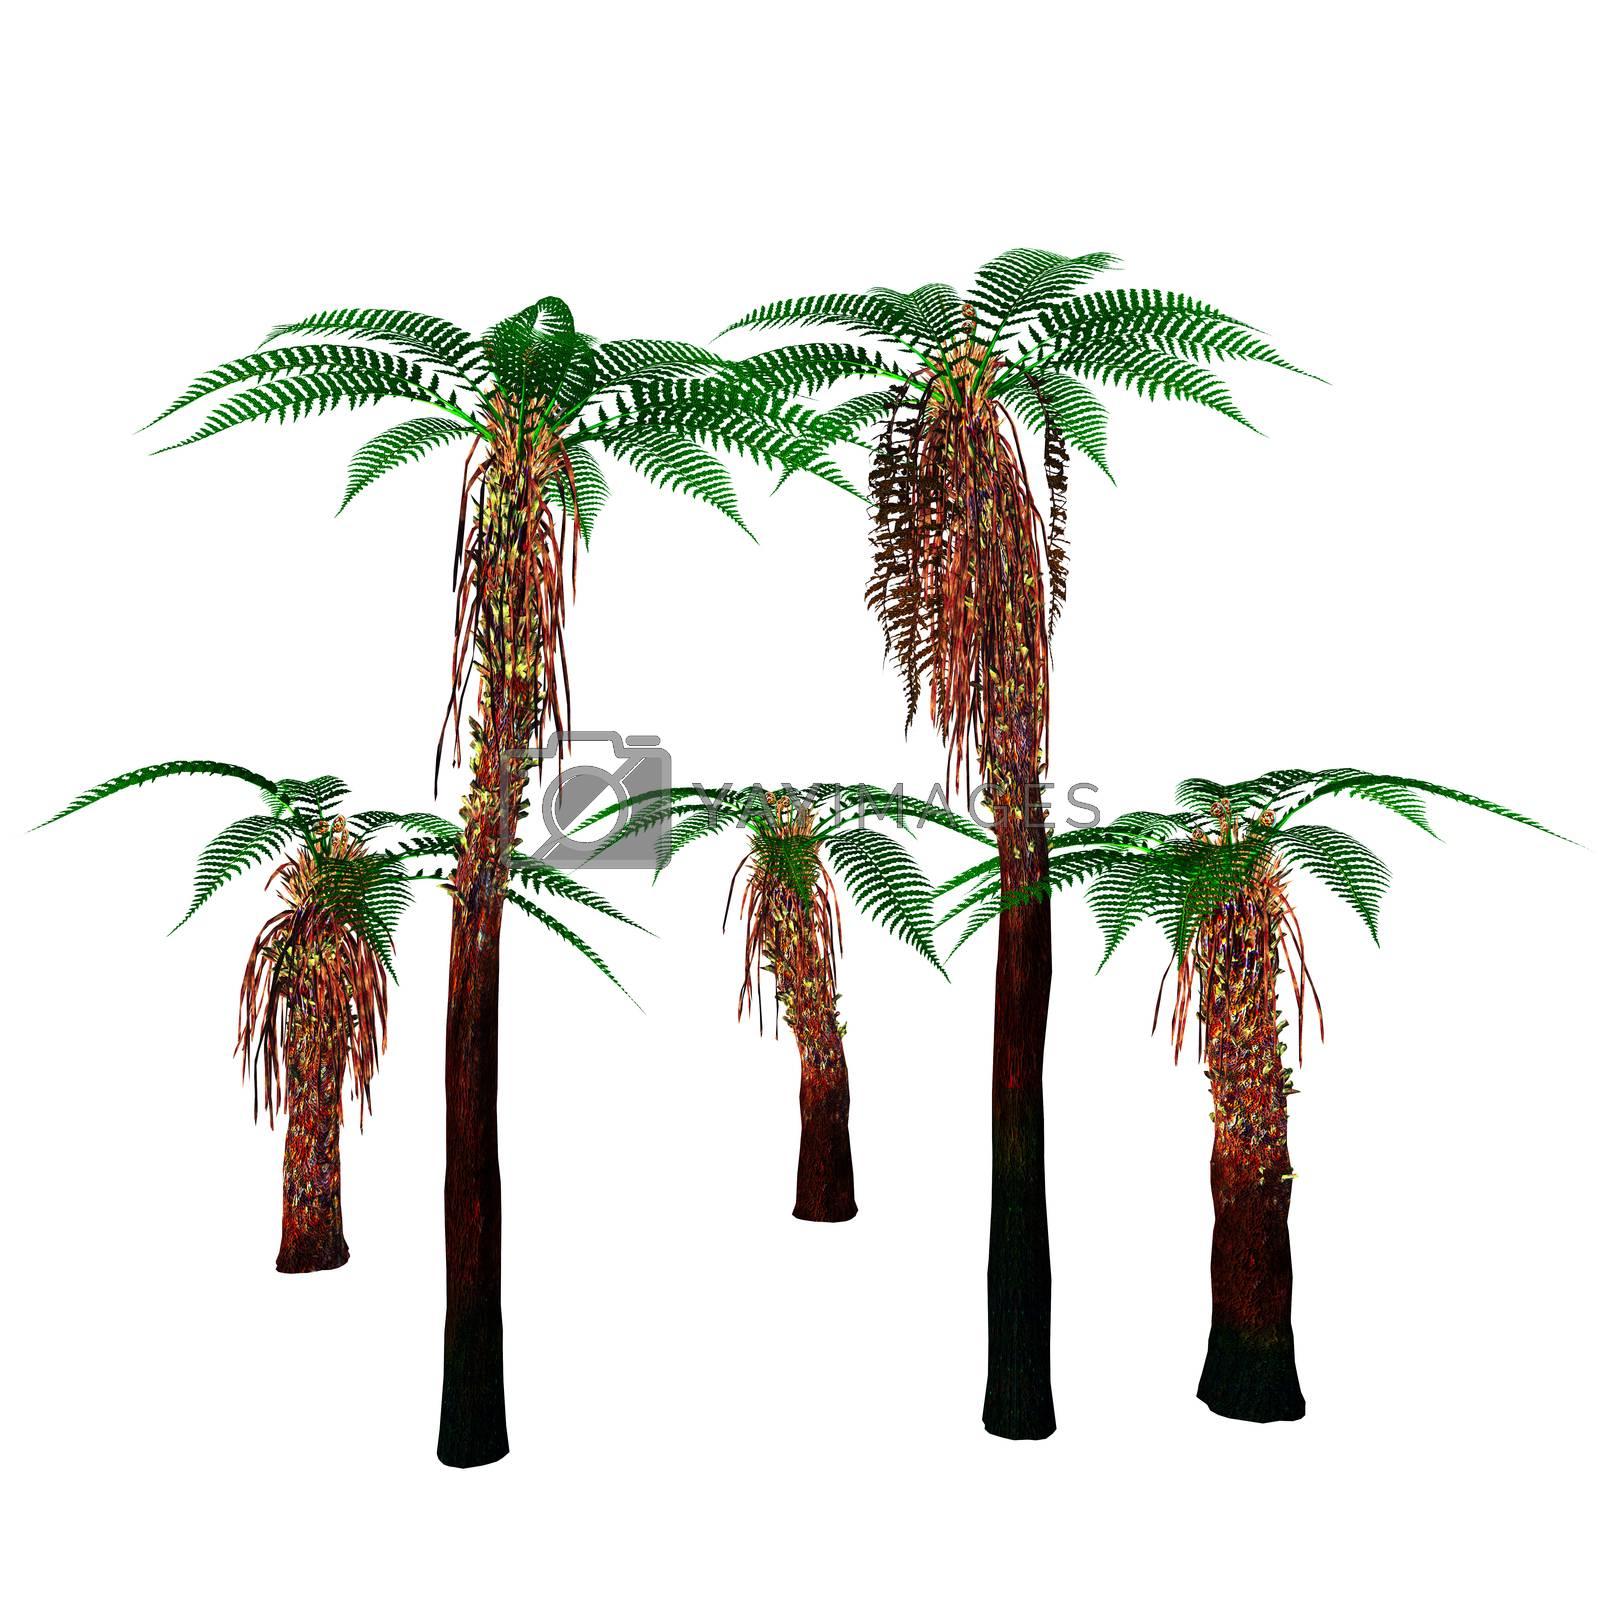 Dicksonia antarctica is an evergreen tree native to Australia and Tasmania.